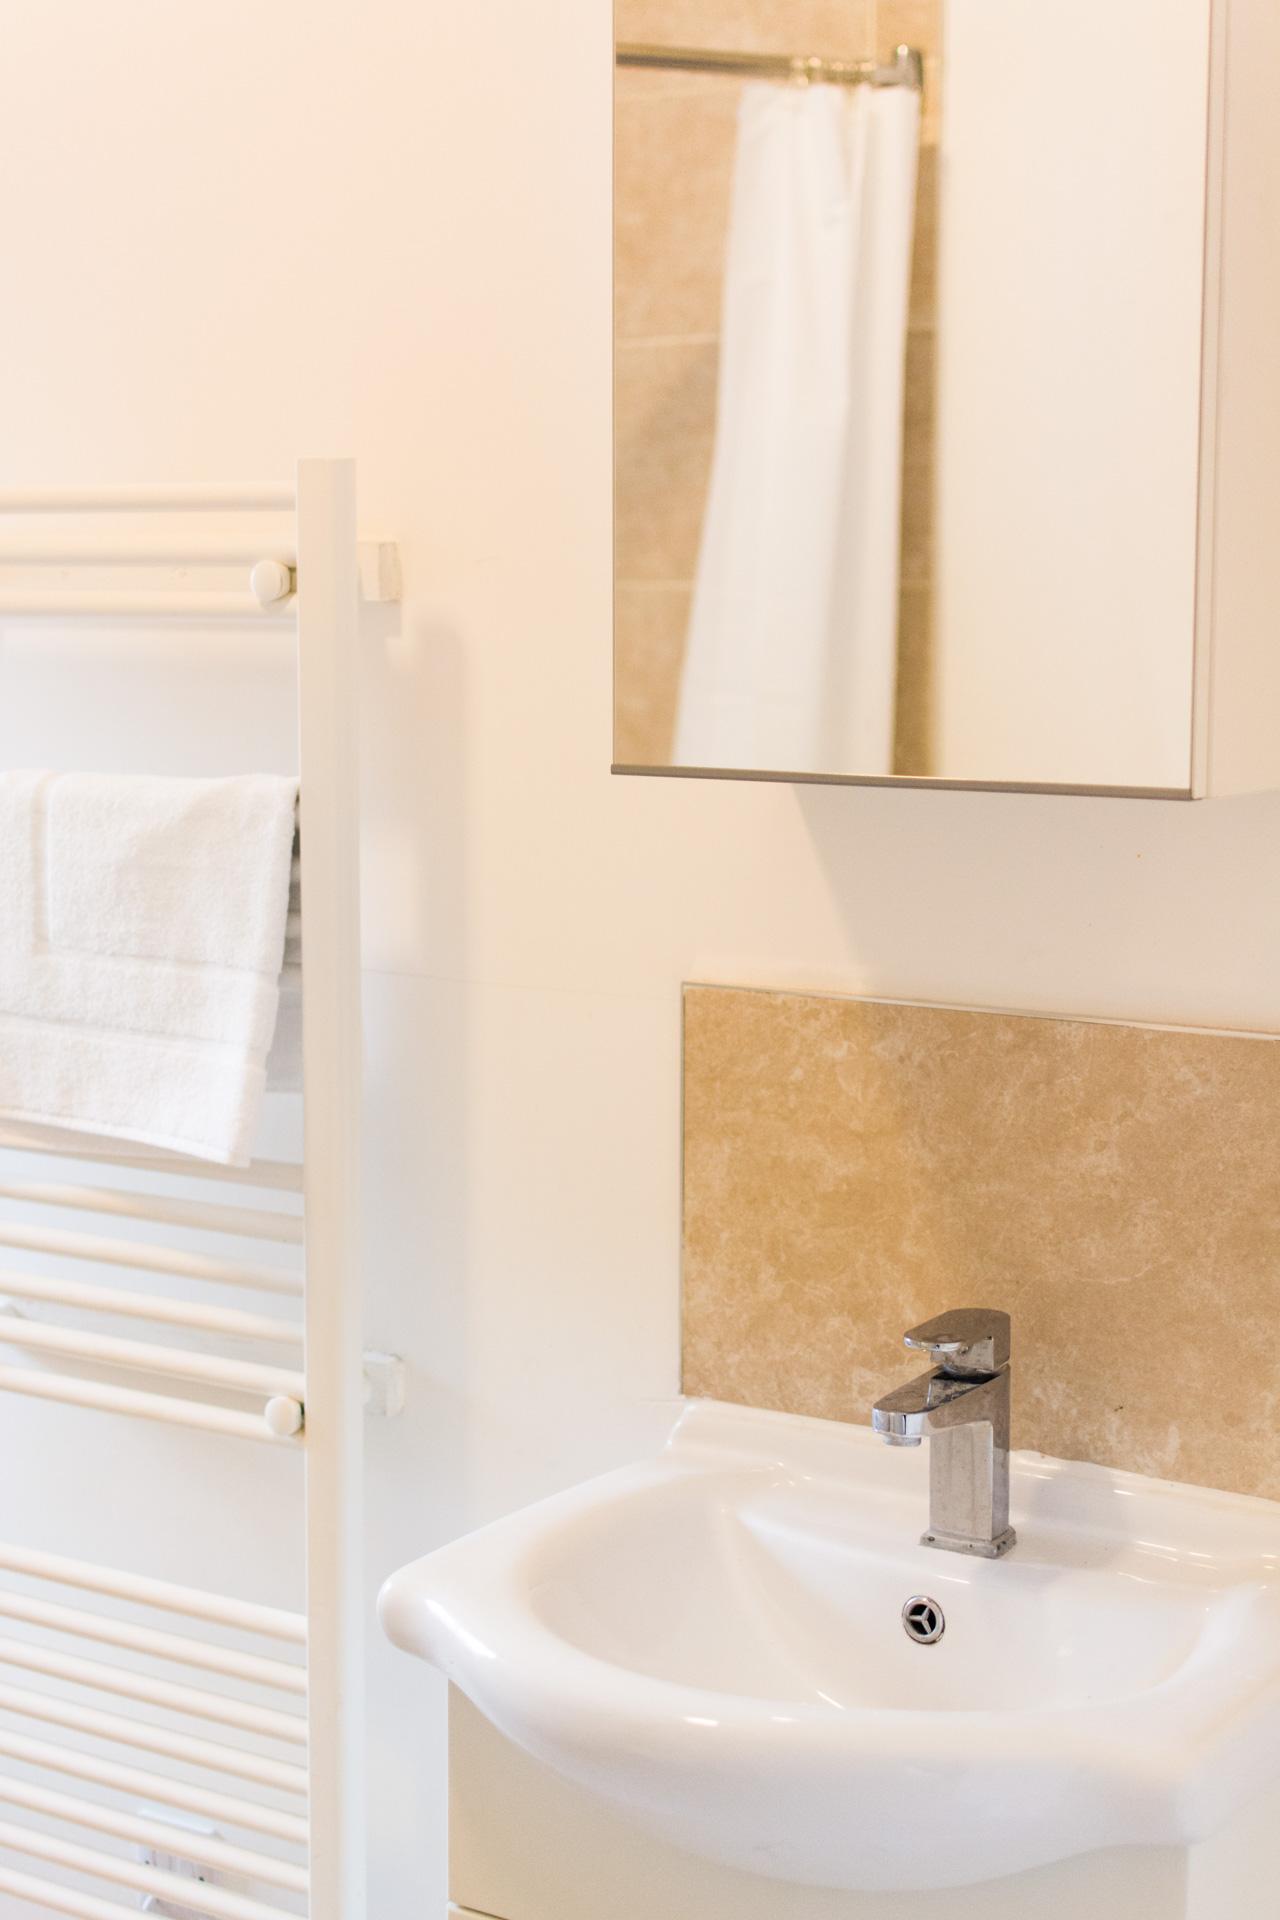 Towel rack and sink.